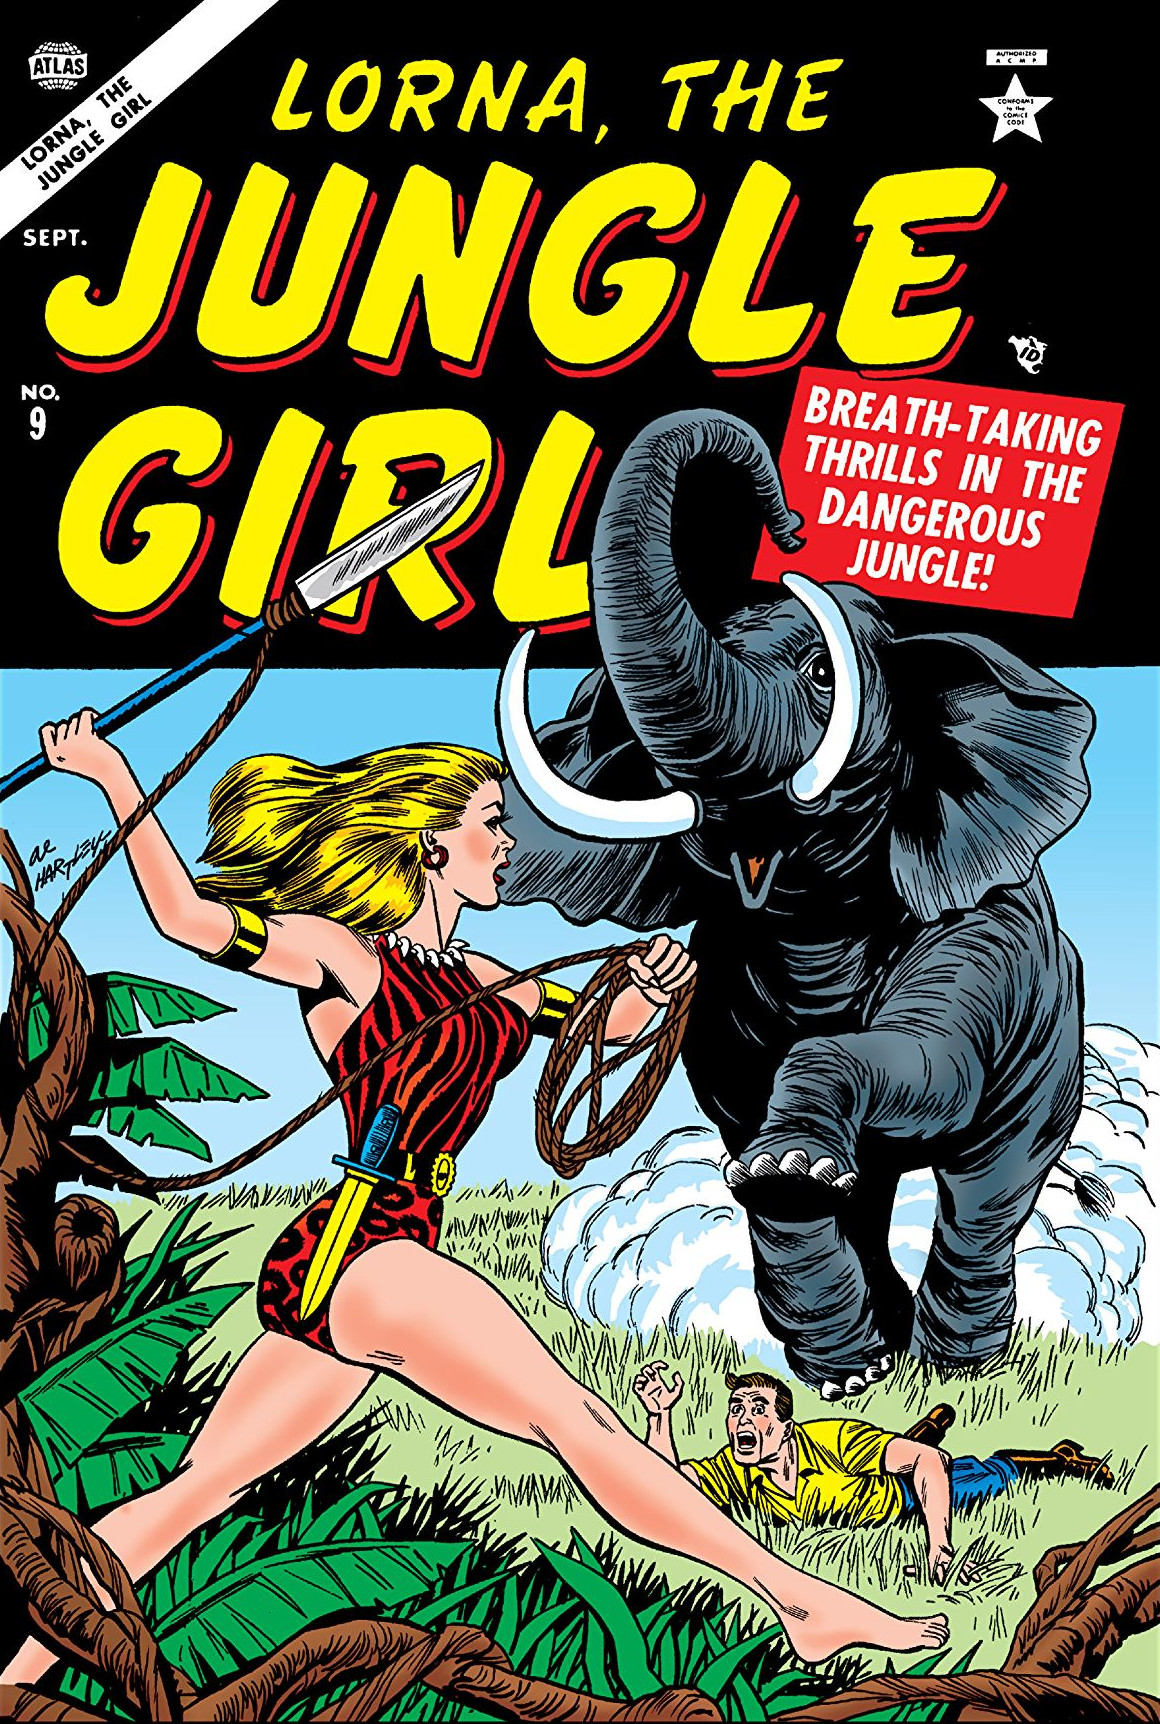 Lorna, the Jungle Girl Vol 1 9